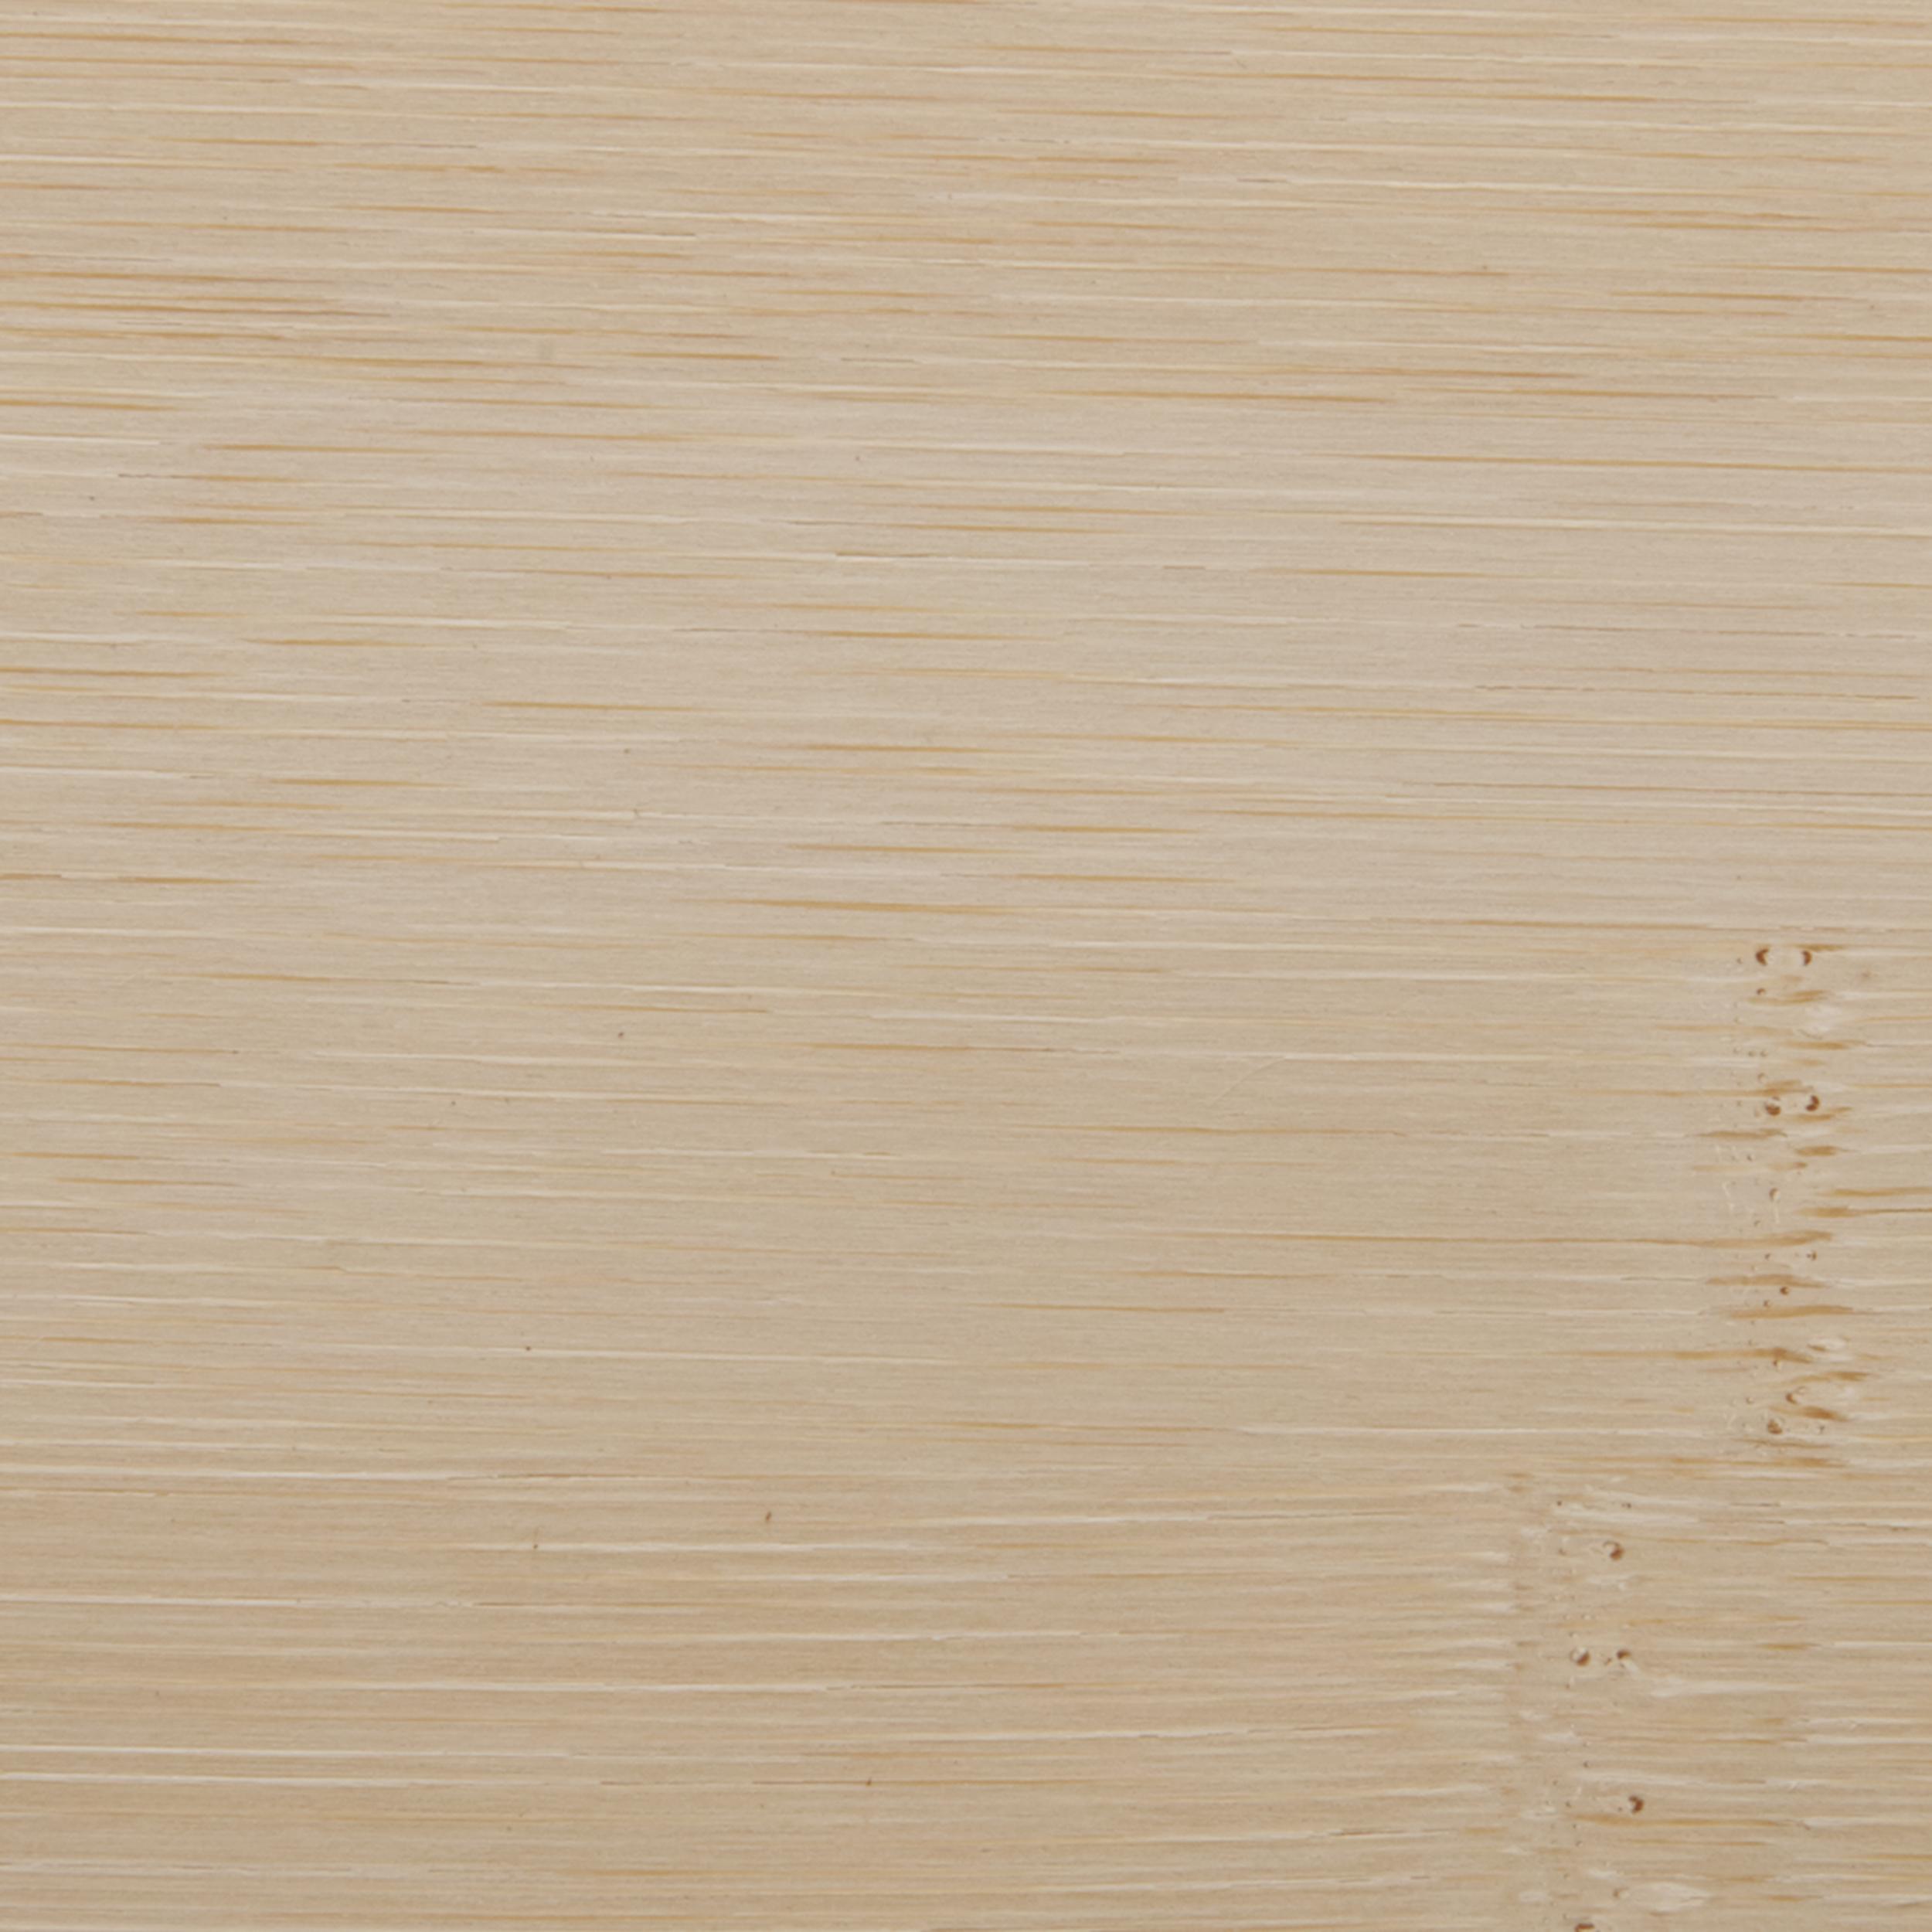 Bamboo Veneer Sheet White Horizontal Grain 4' x 8' 2-Ply Wood on Wood